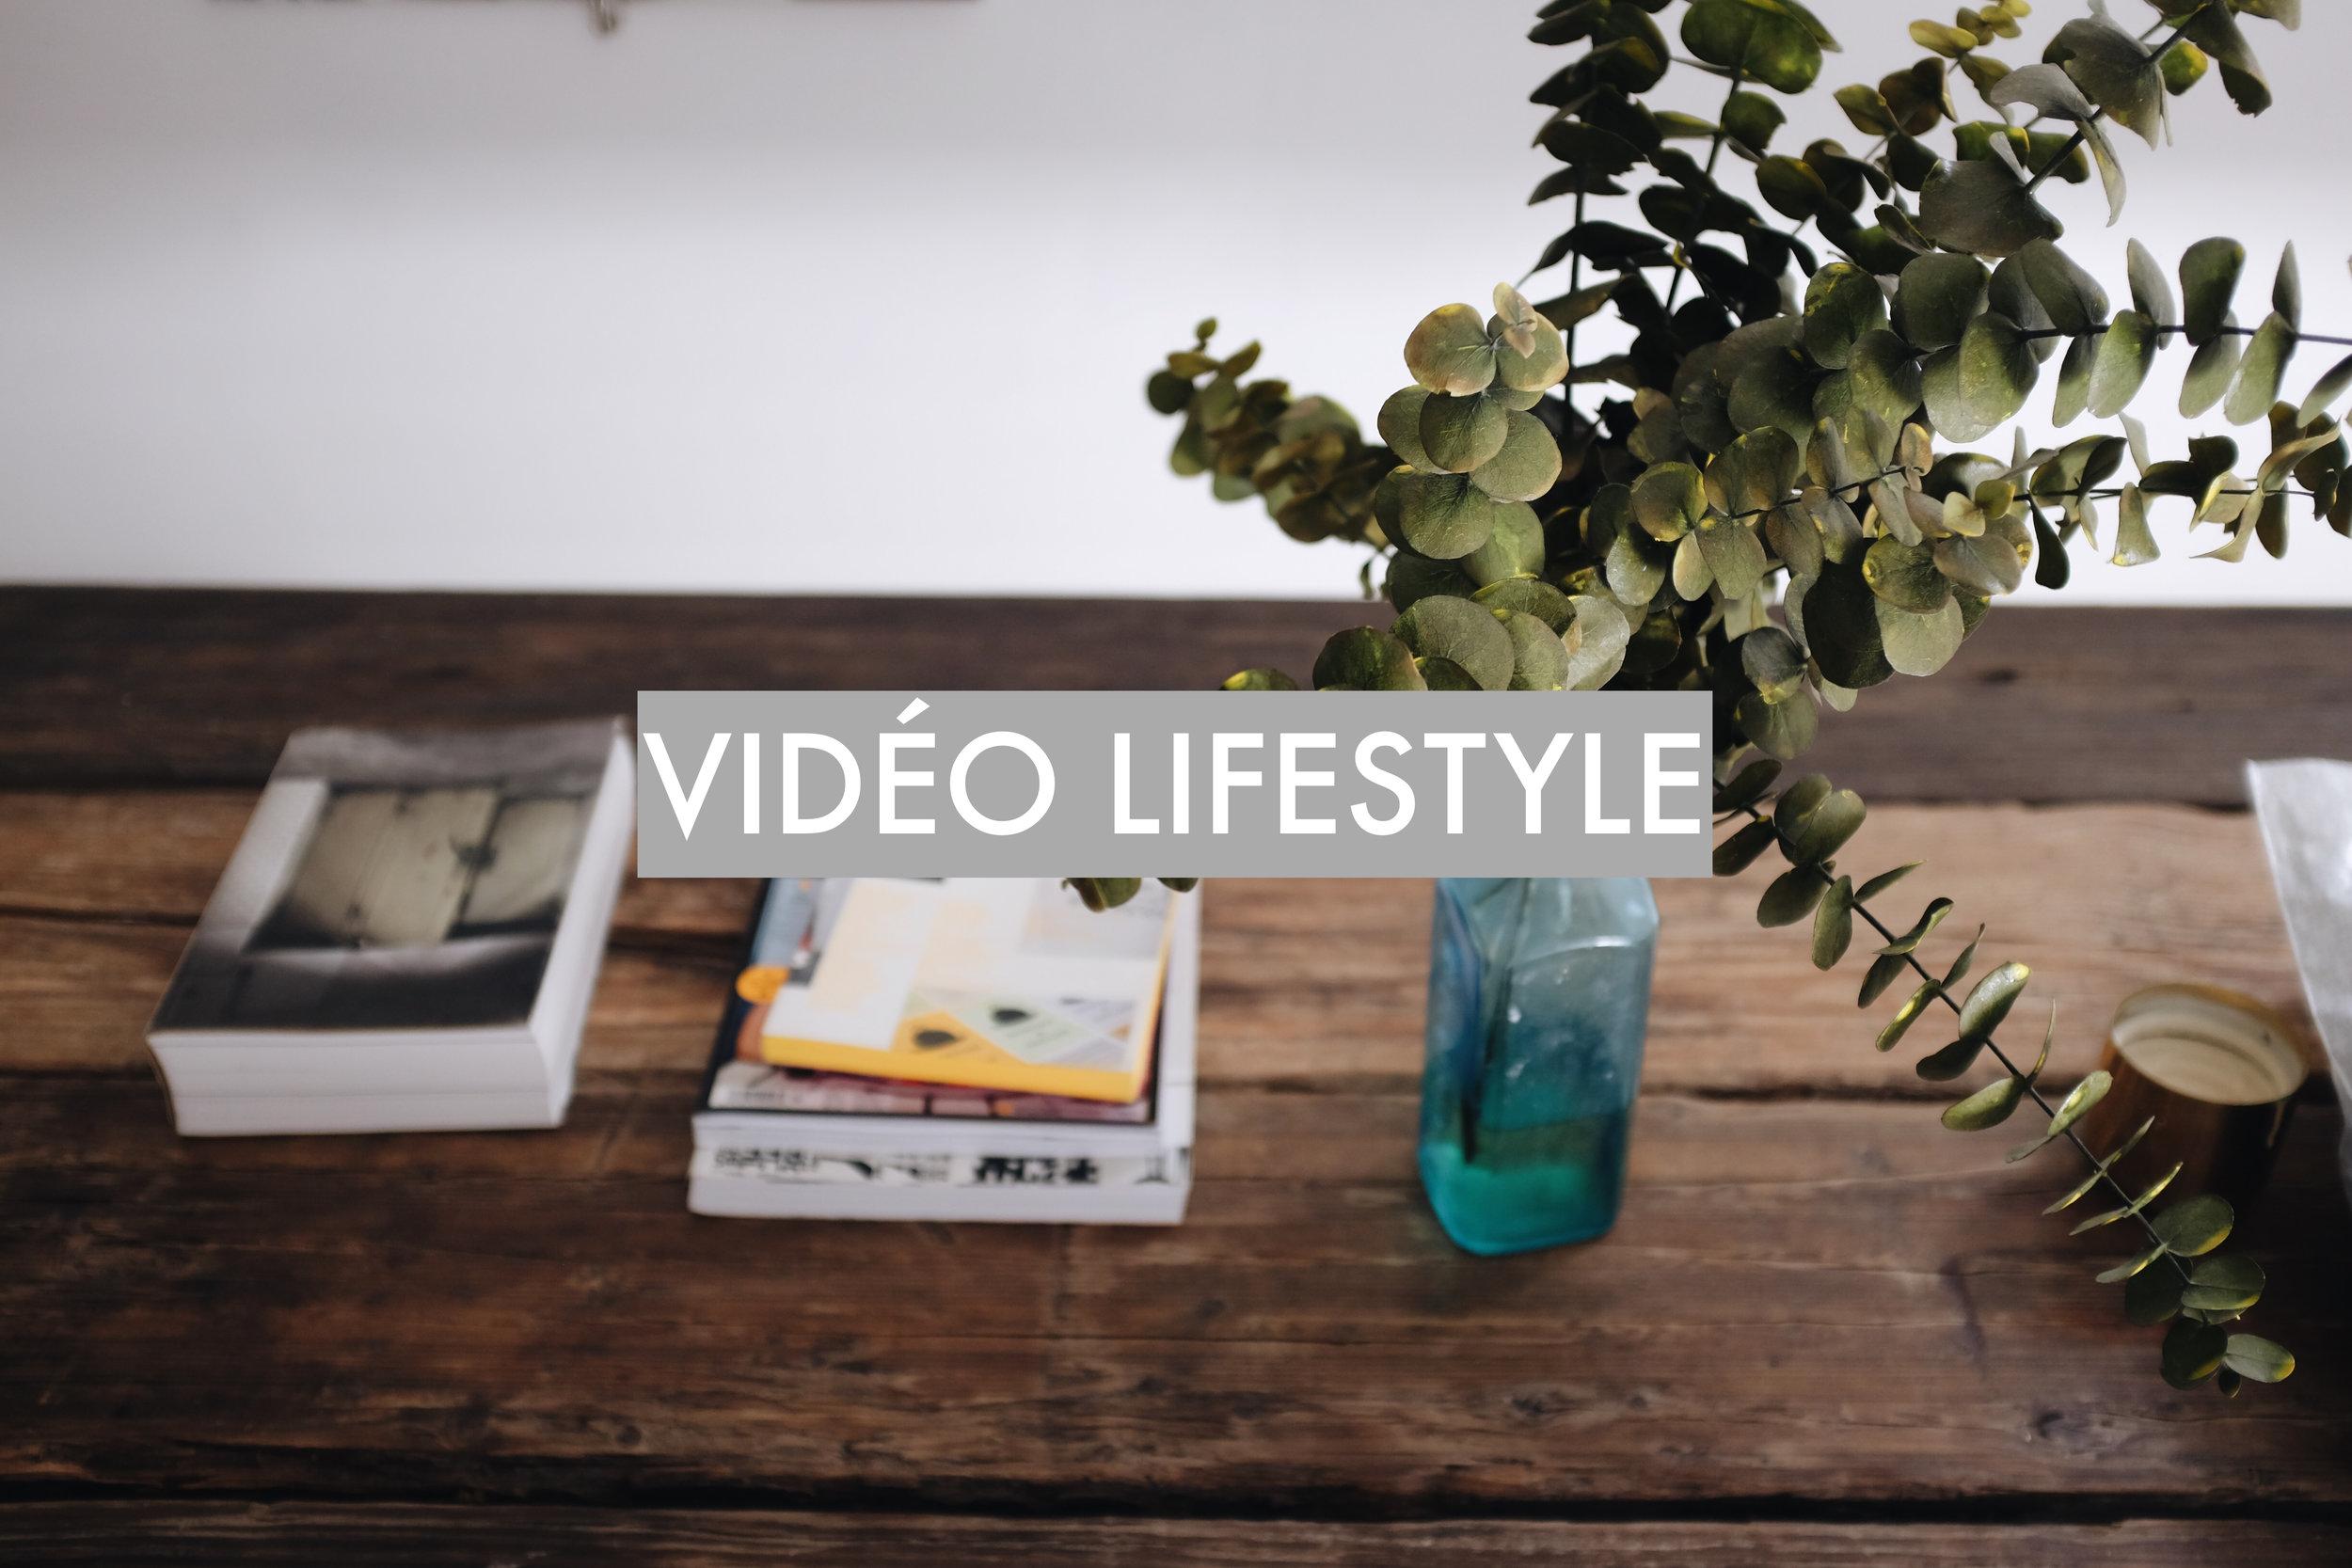 video lifestyle.jpg